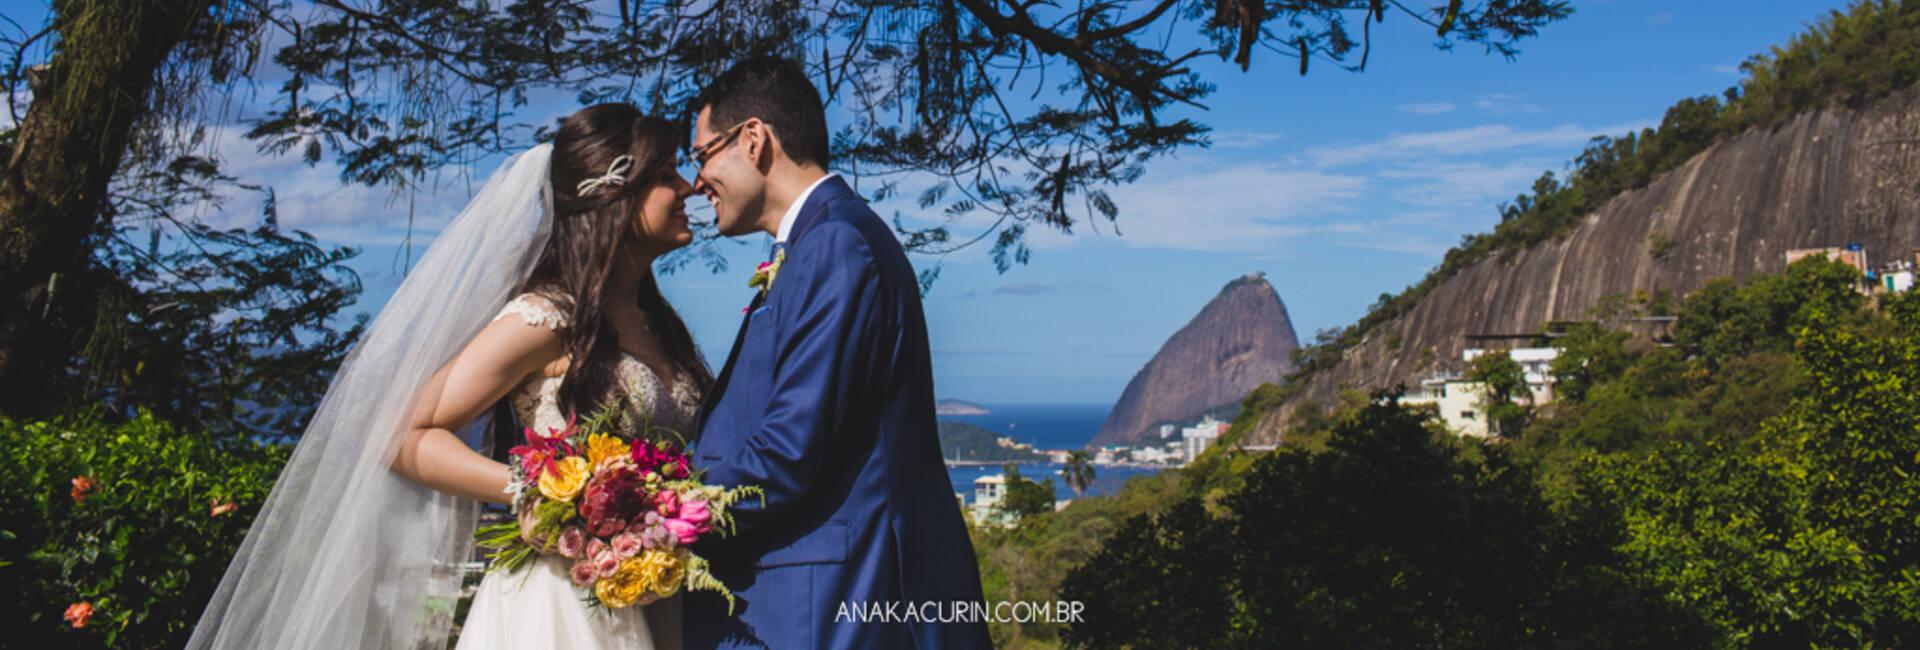 Casamento de LARISSA + DANIEL